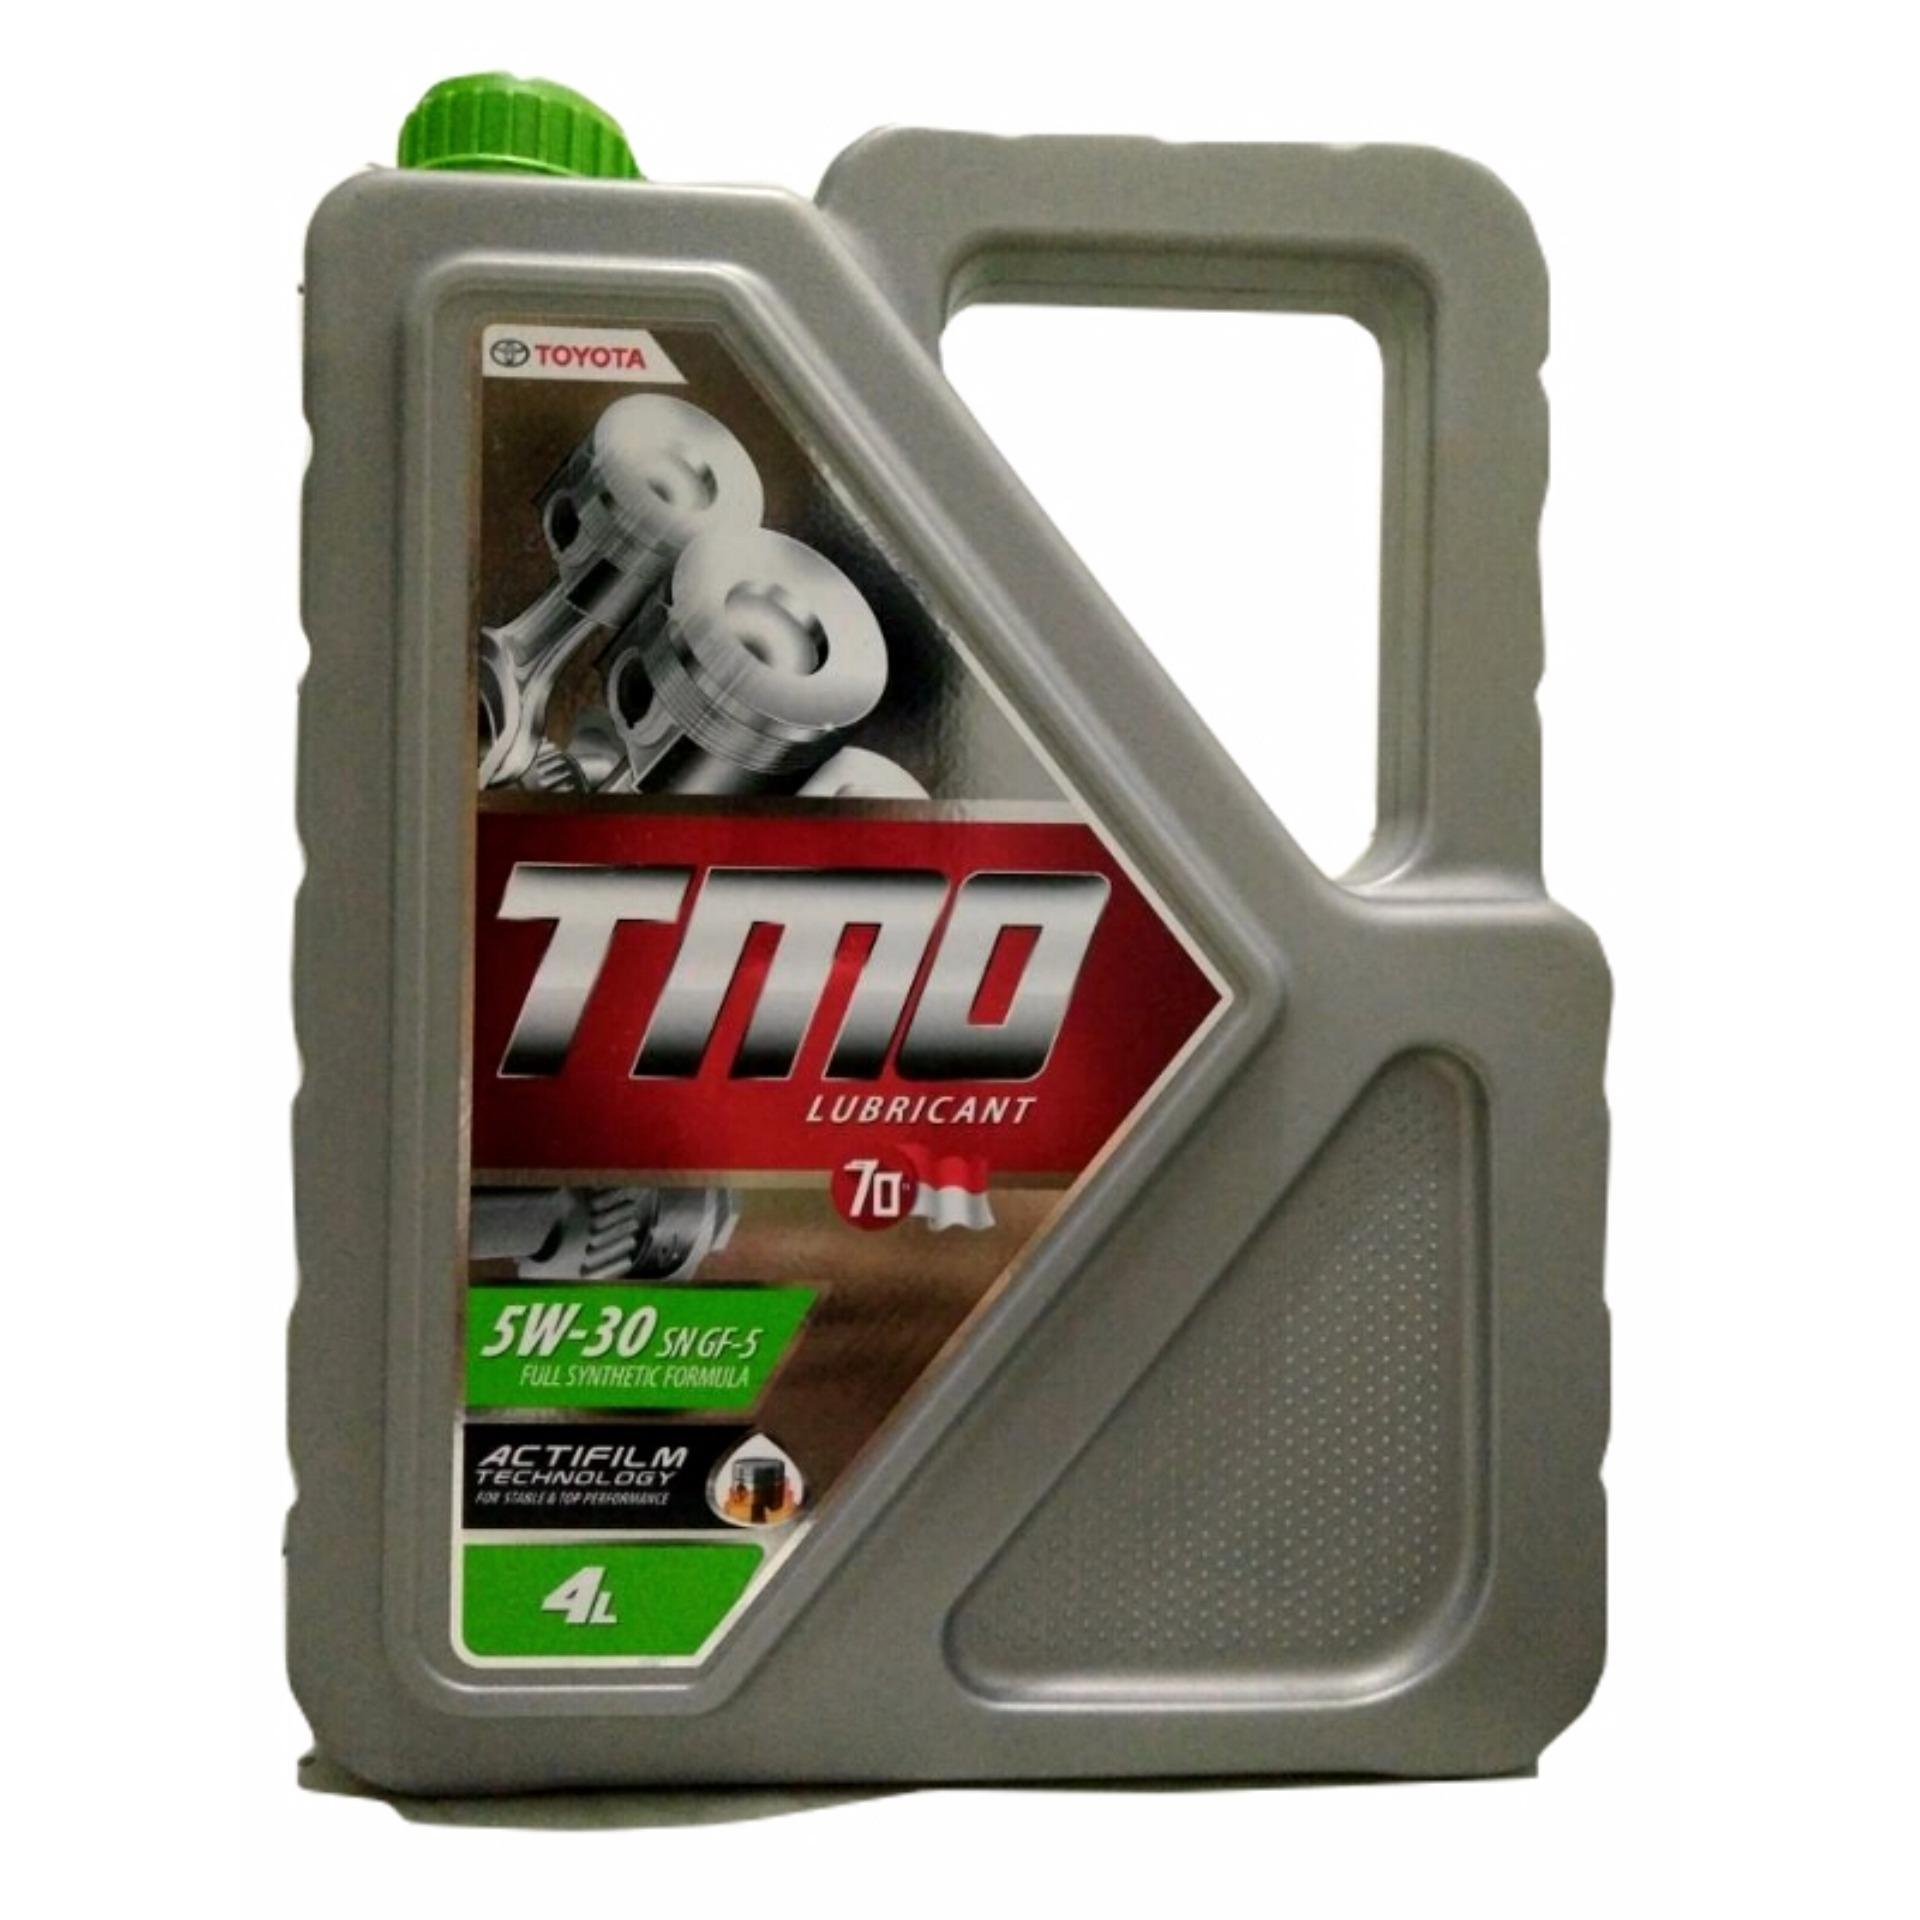 Toyota Motor Oil TMO Green 5w-30 4Liter Oli Mesin Mobil Original ATPM